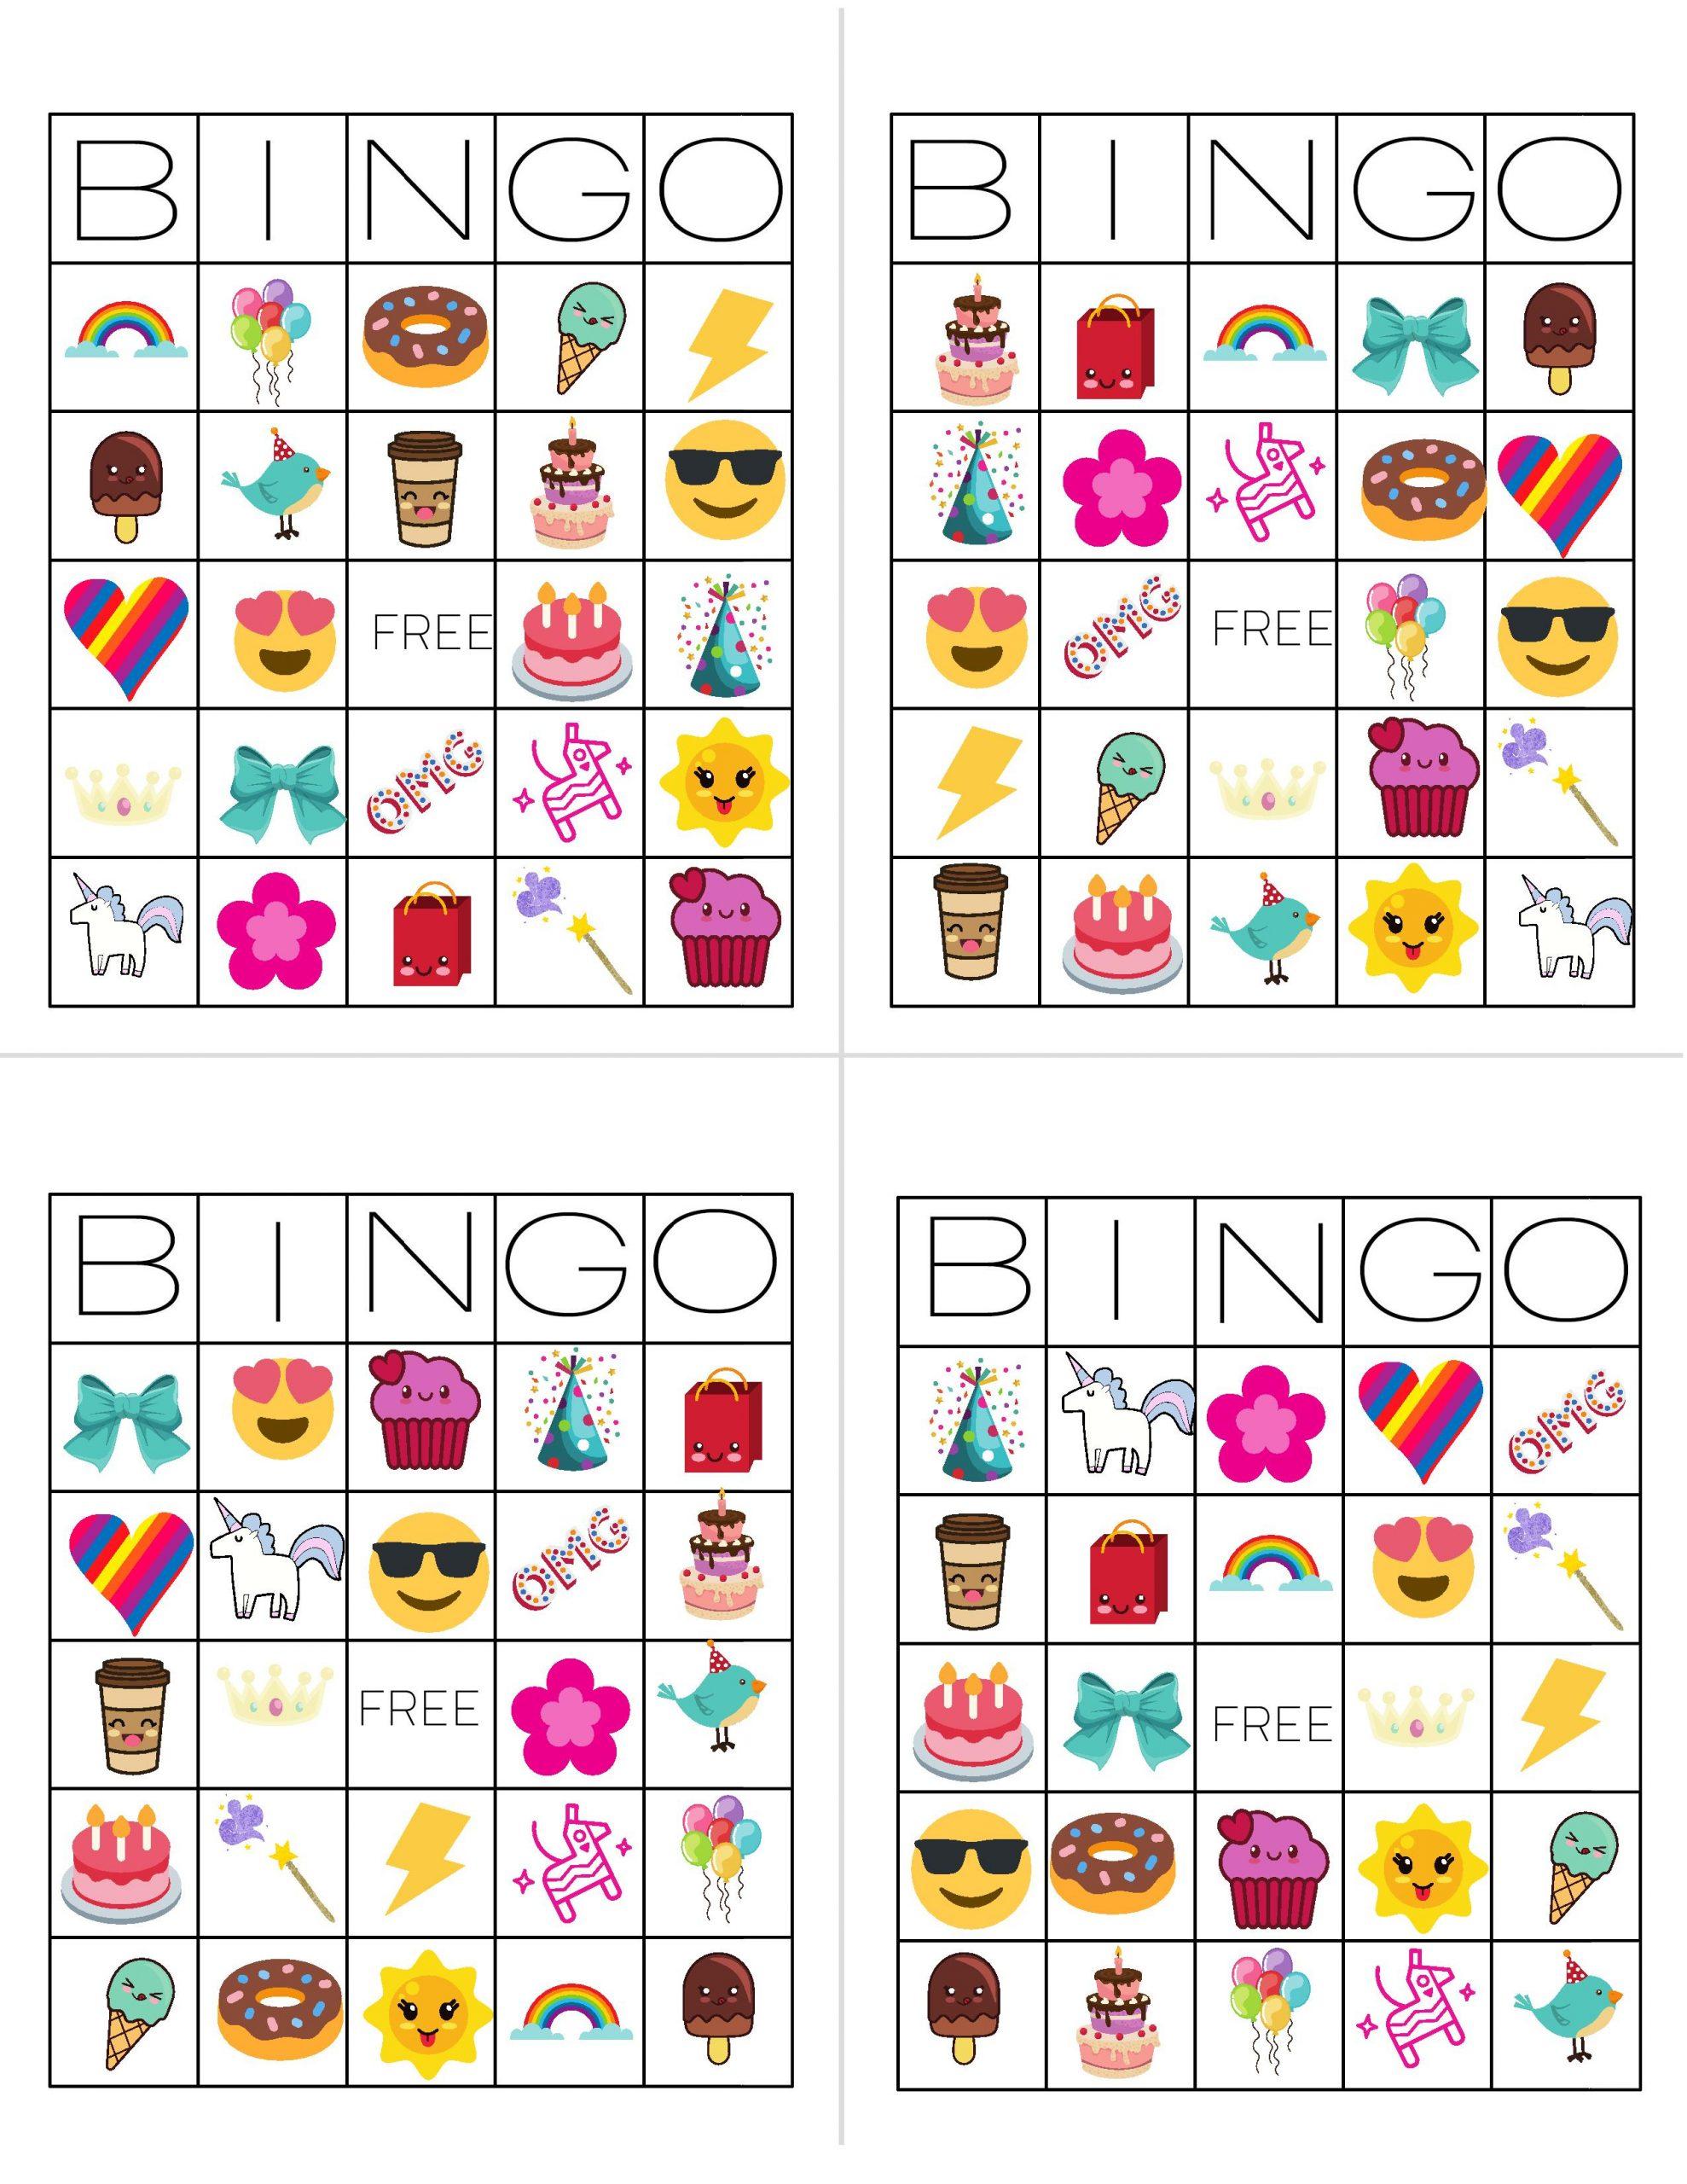 Unicorn Bingo Free Printable Download - Tinselbox